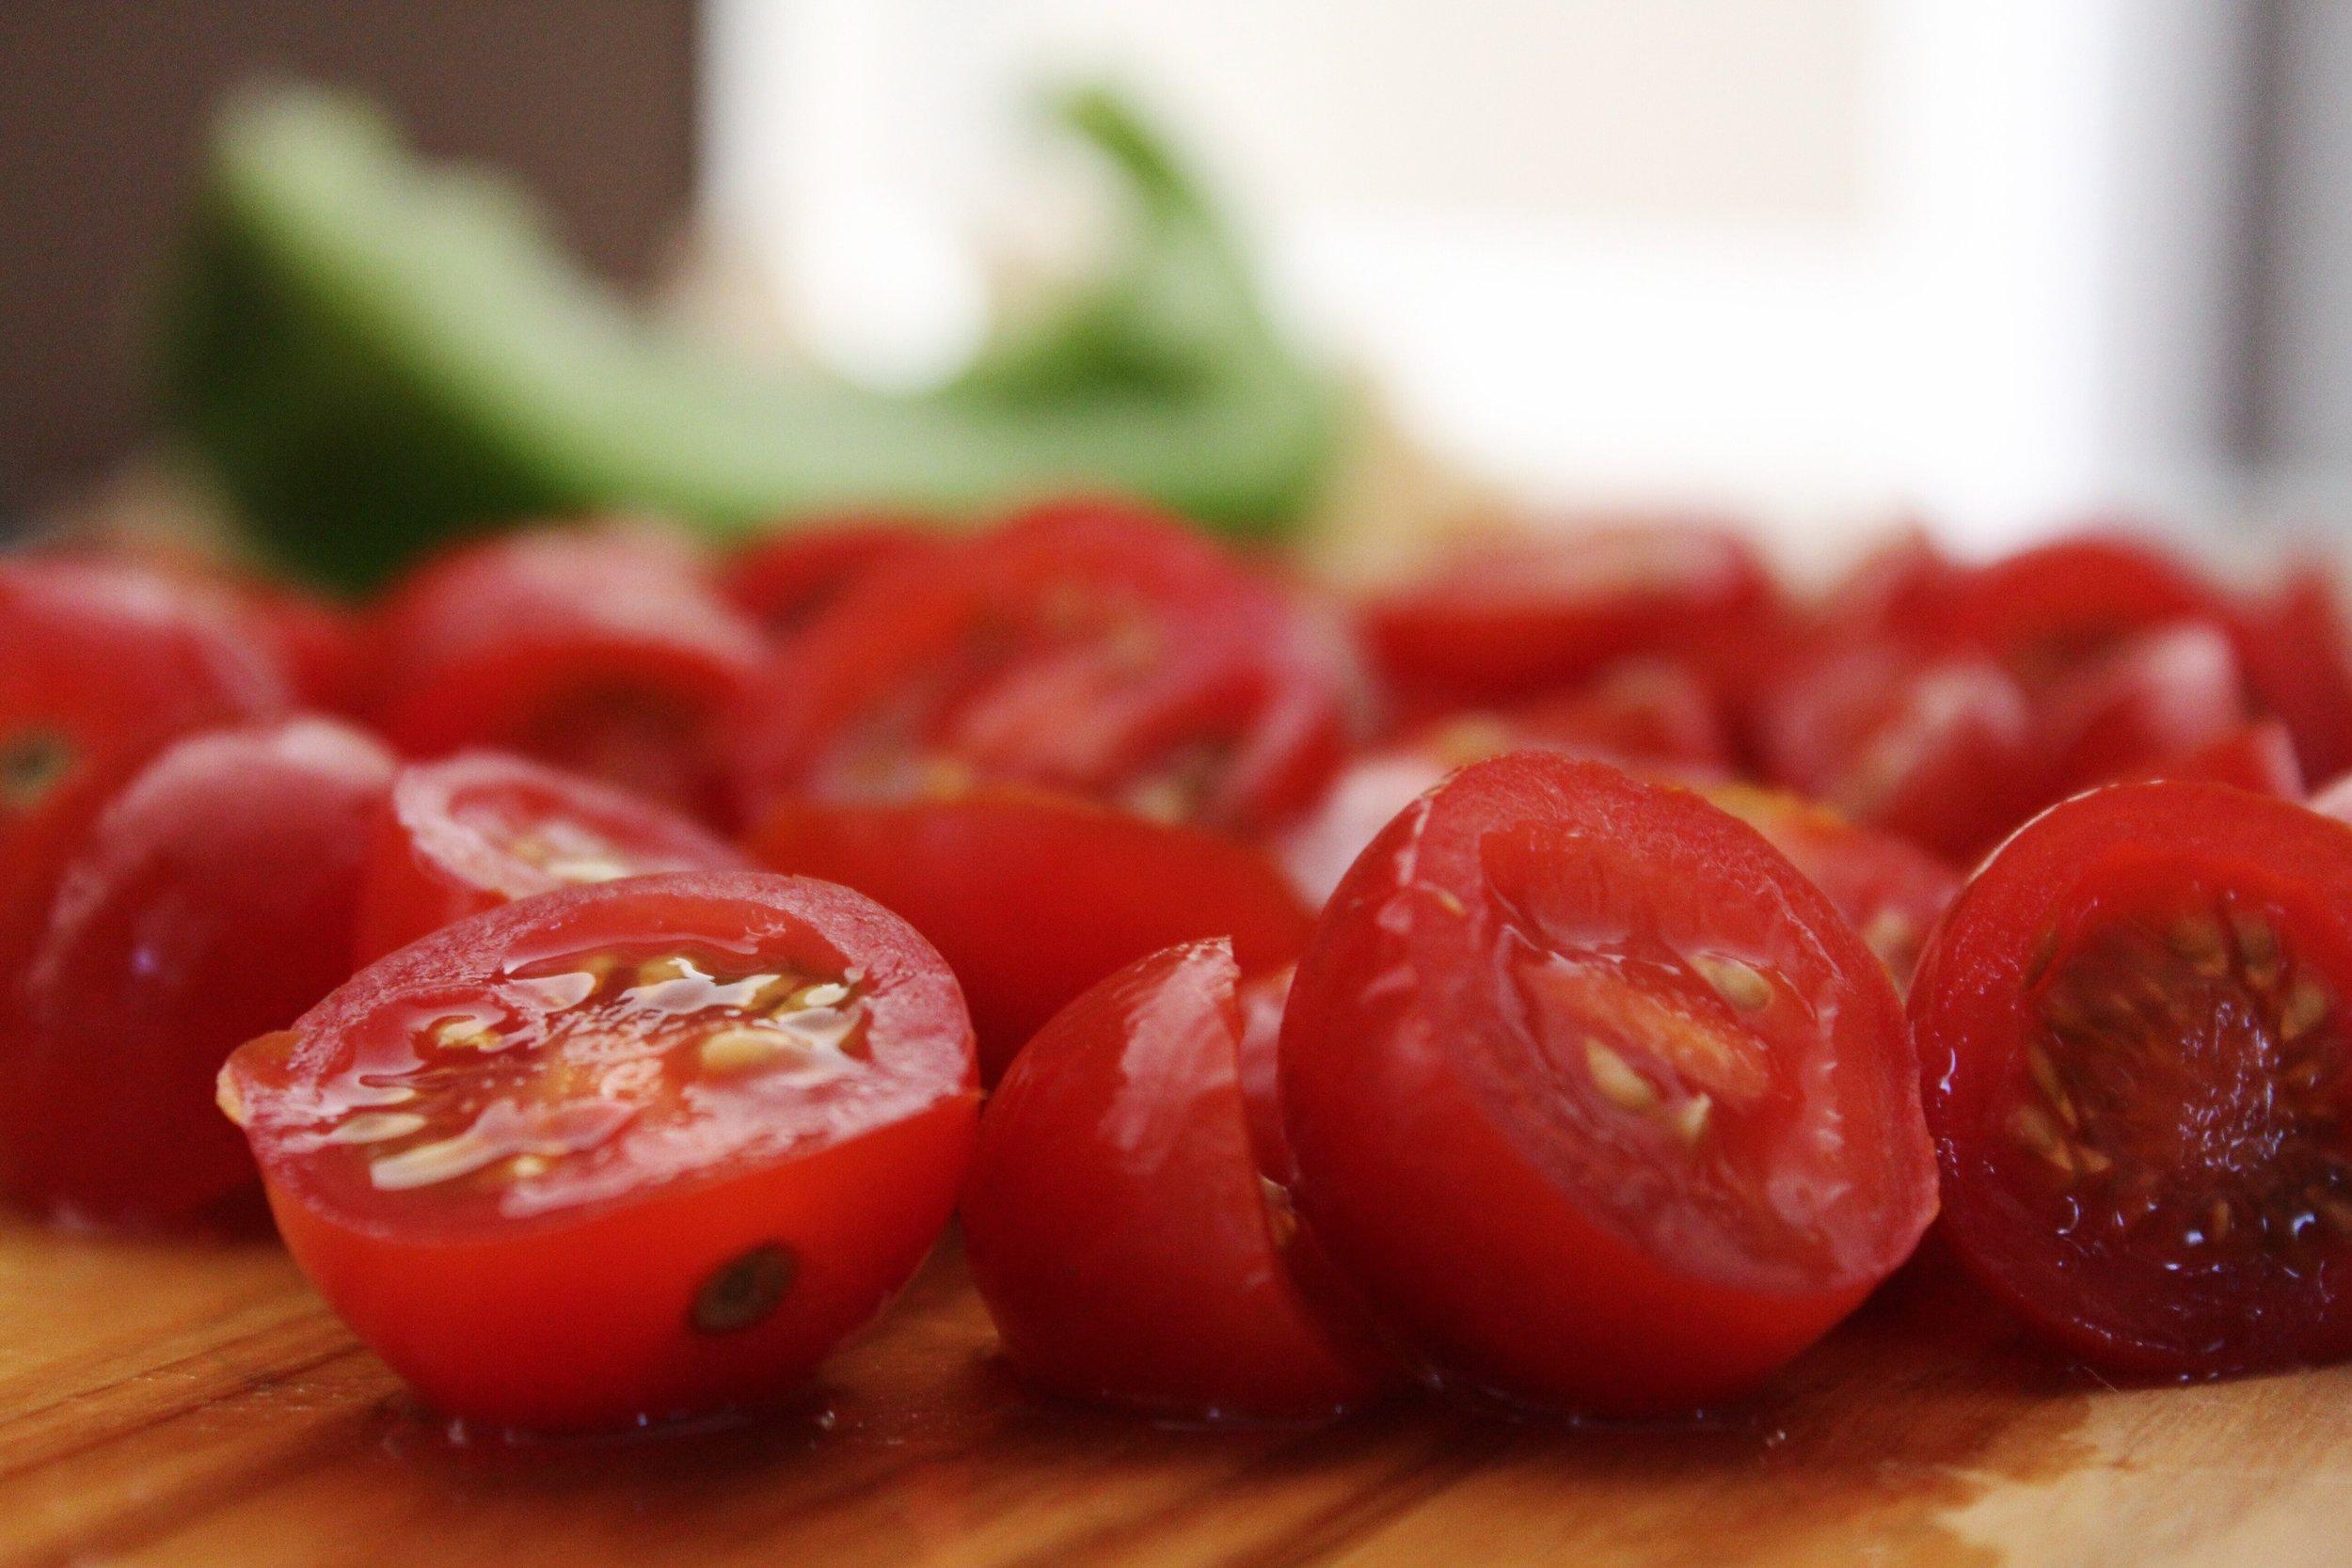 blur-cherry-tomatoes-close-up-906110.jpg